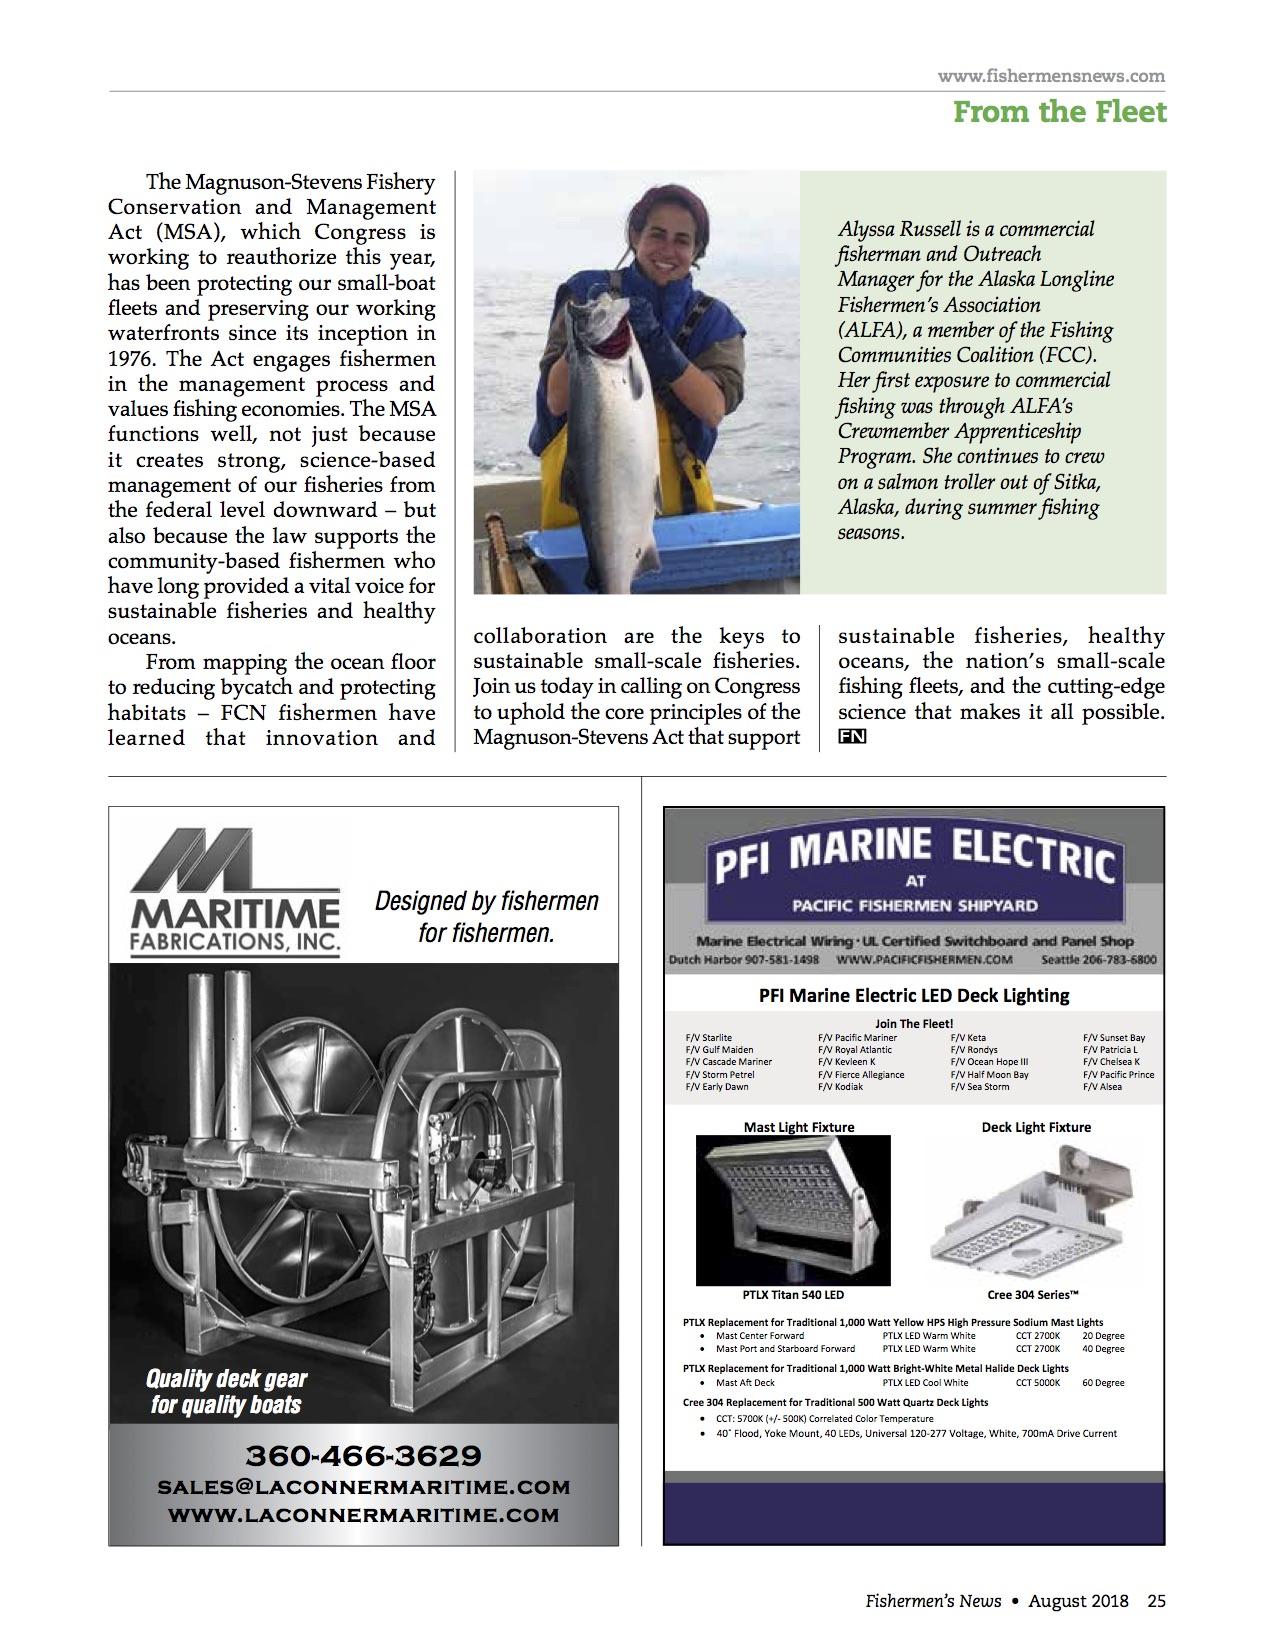 Fishermen's News Alyssa Russell Aug 2018 p2.jpg